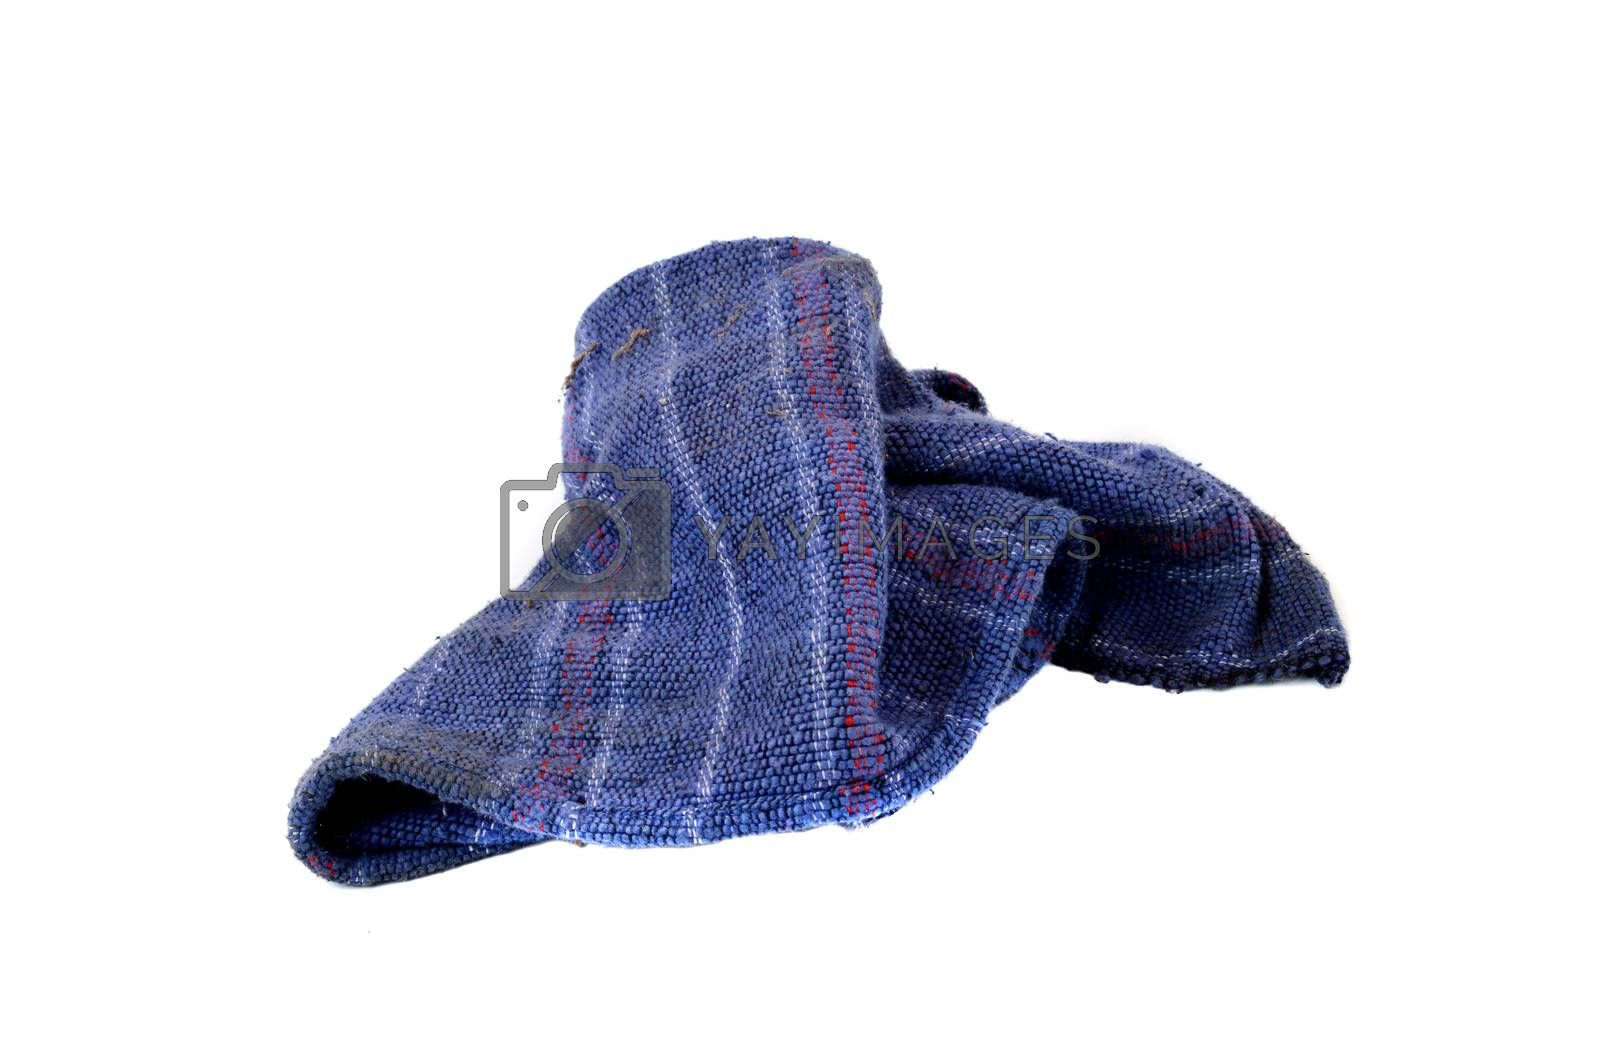 cloth duster by antonihalim